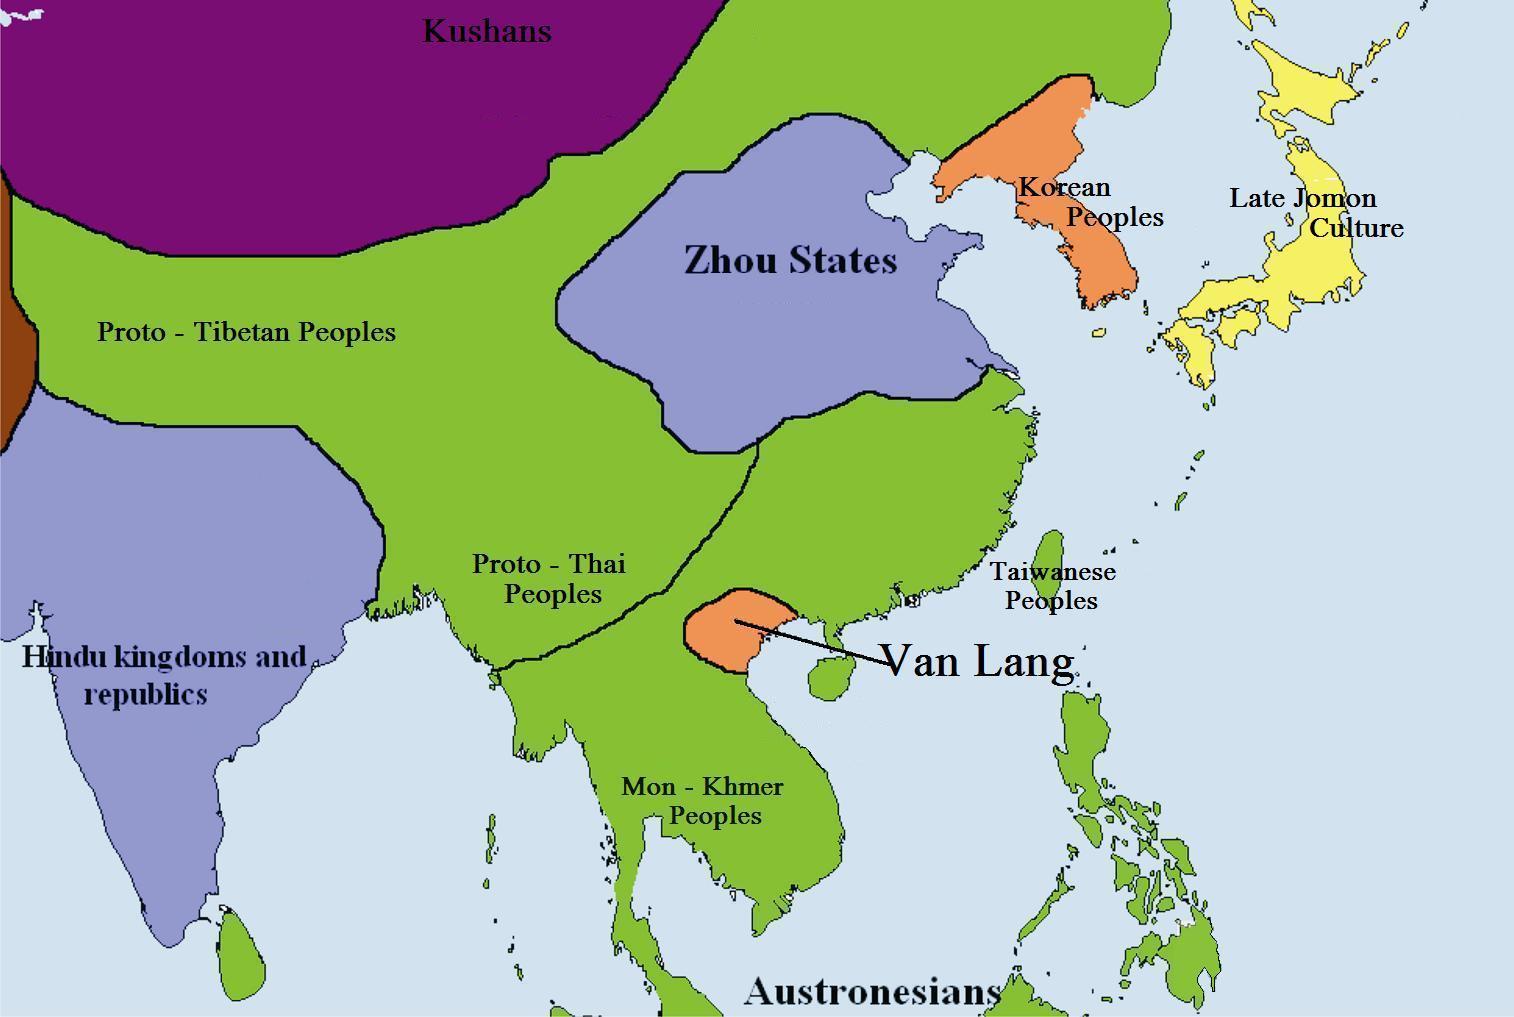 500s BCE